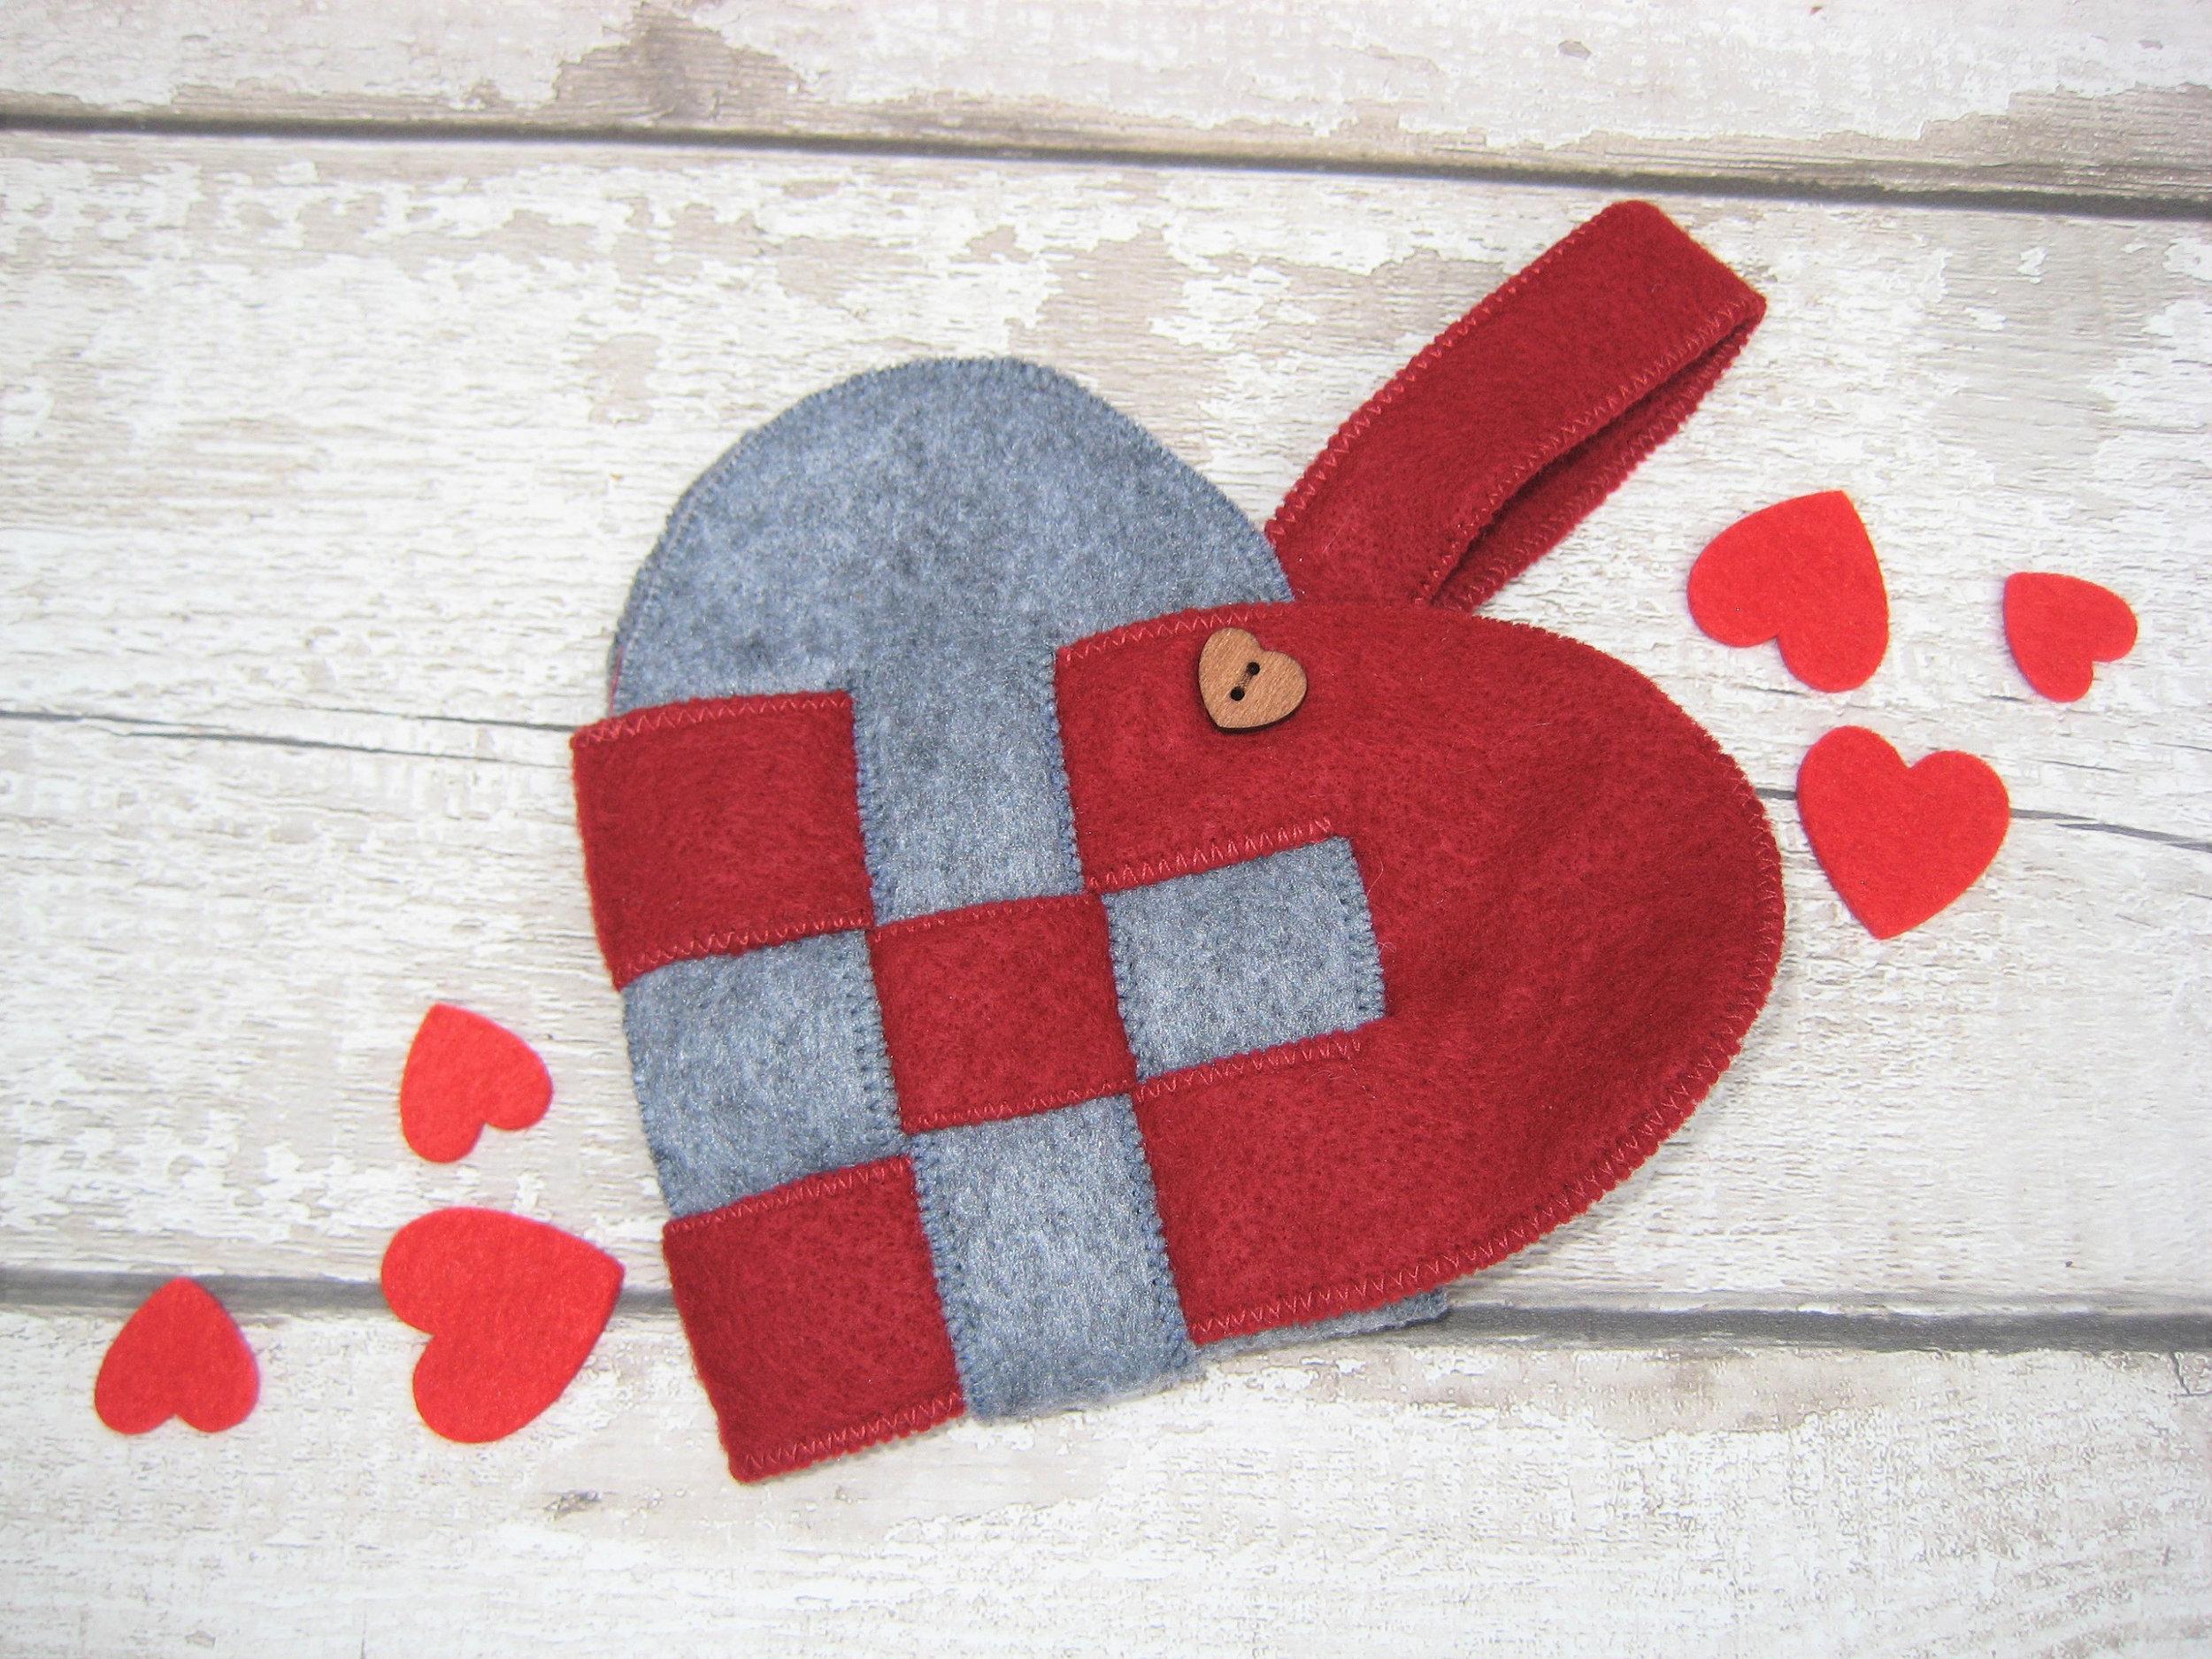 Woven heart basket